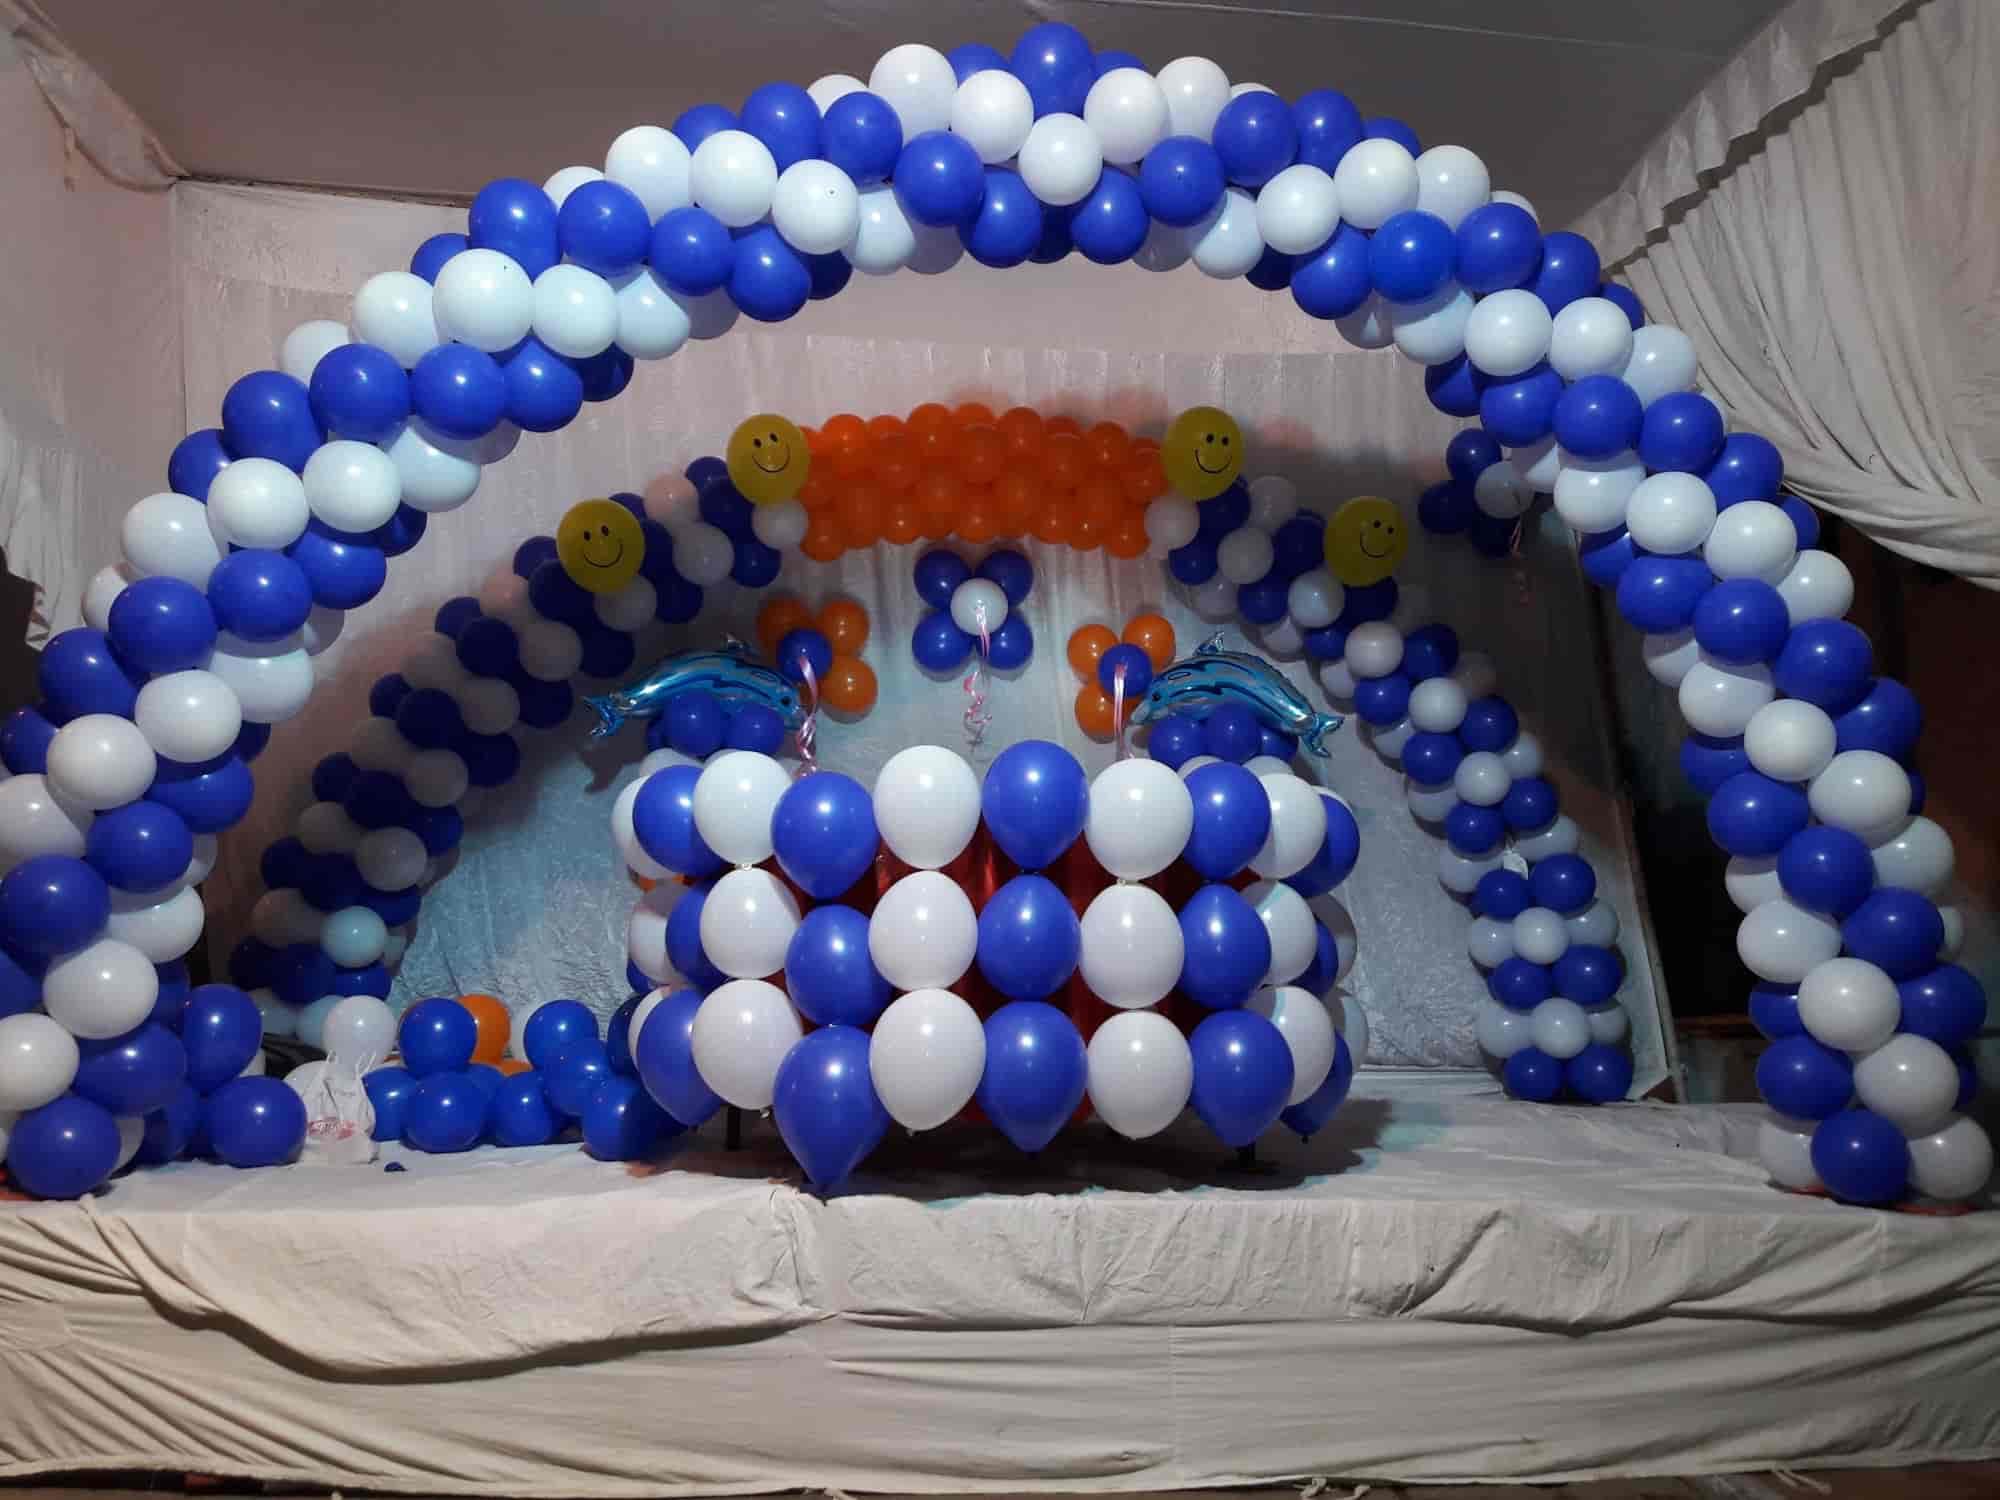 Balloon Decoration Part - 43: ... Balloon Decoration - Saini Balloon Decoration U0026 Flower Works Photos,  Gwalior City, ...